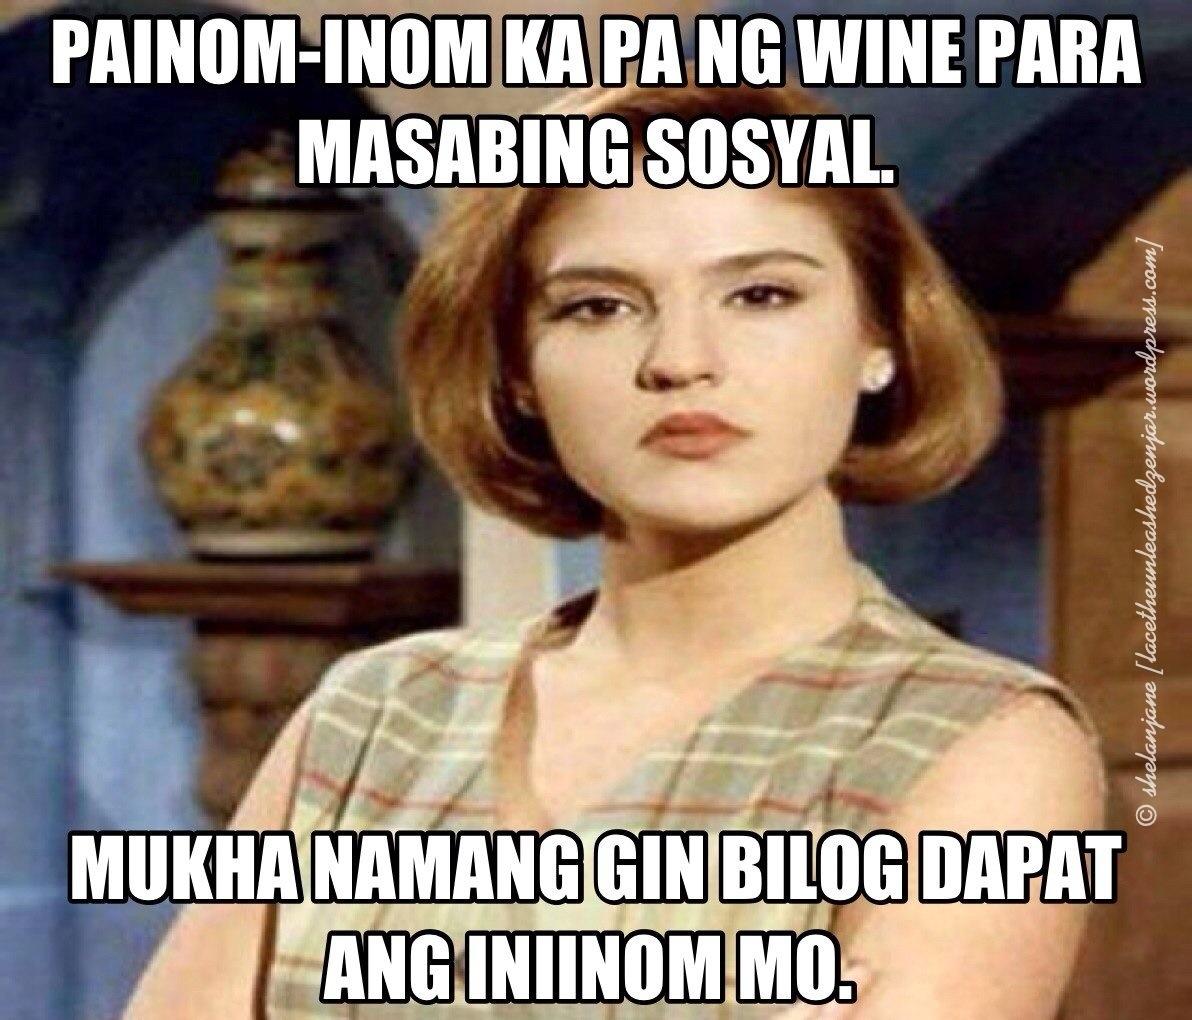 Funny Pinoy Meme Photos : Senyora santibanez funny meme pinoy jokes atbp